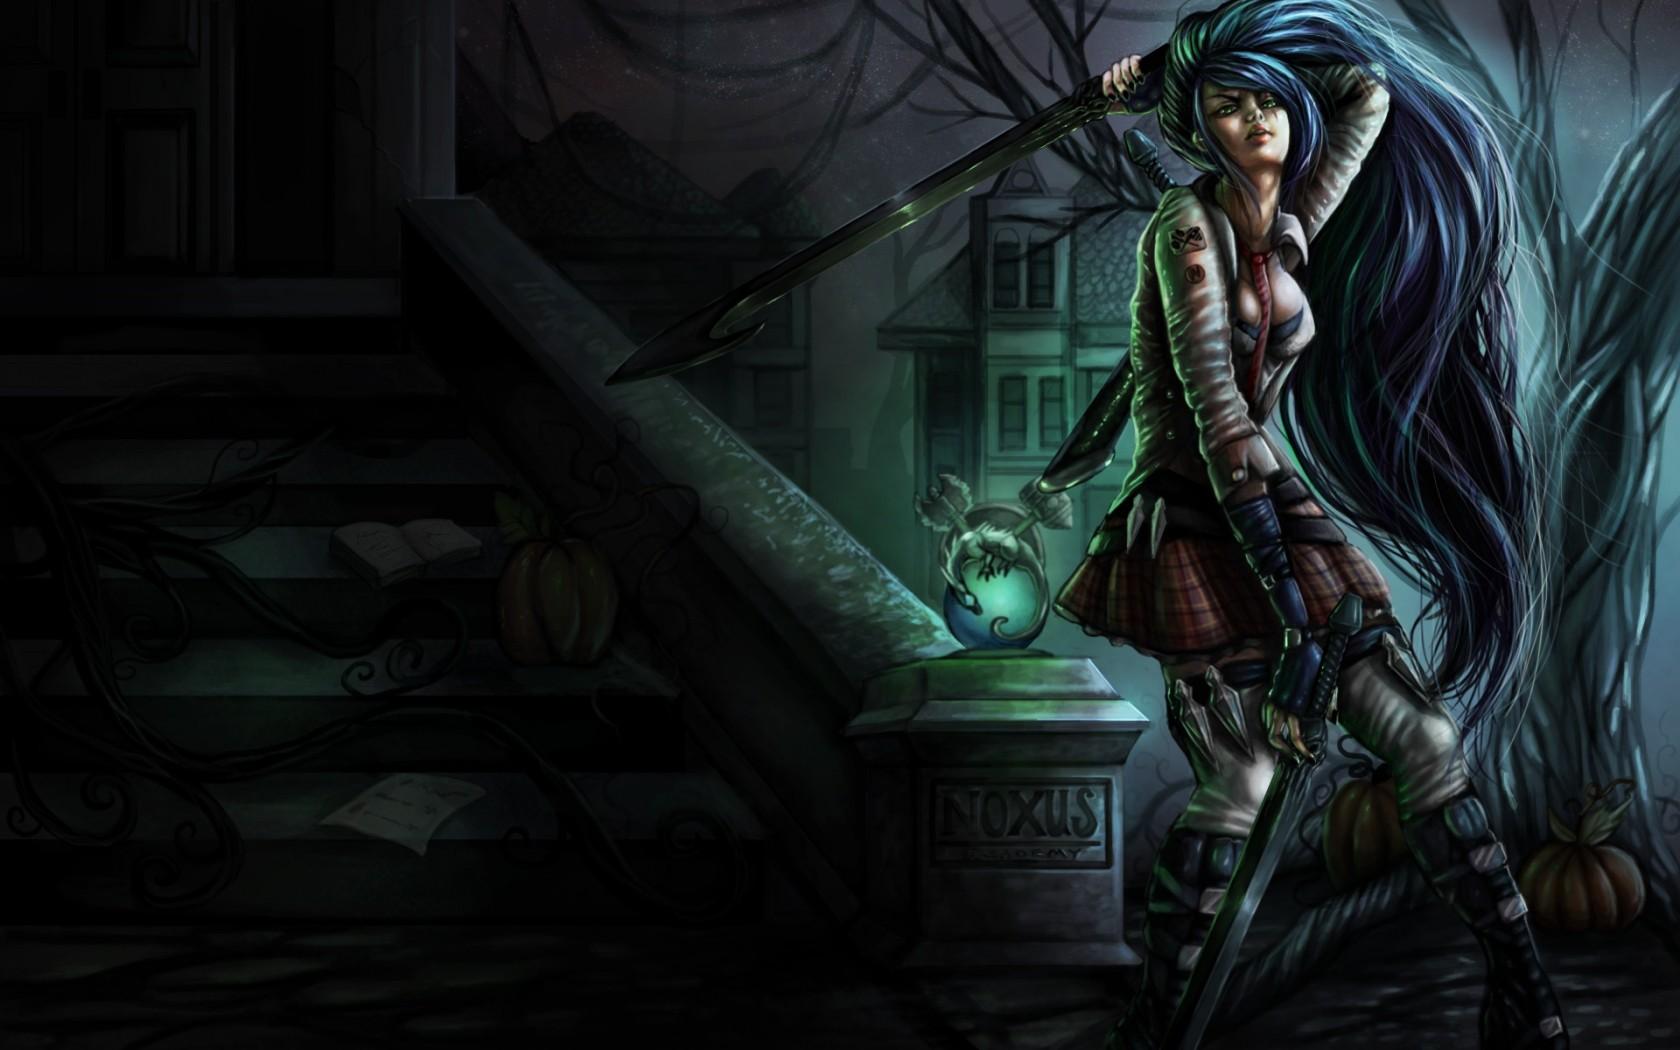 Free Download Weapons Fantasy Art Sexy Babes Magic Dark